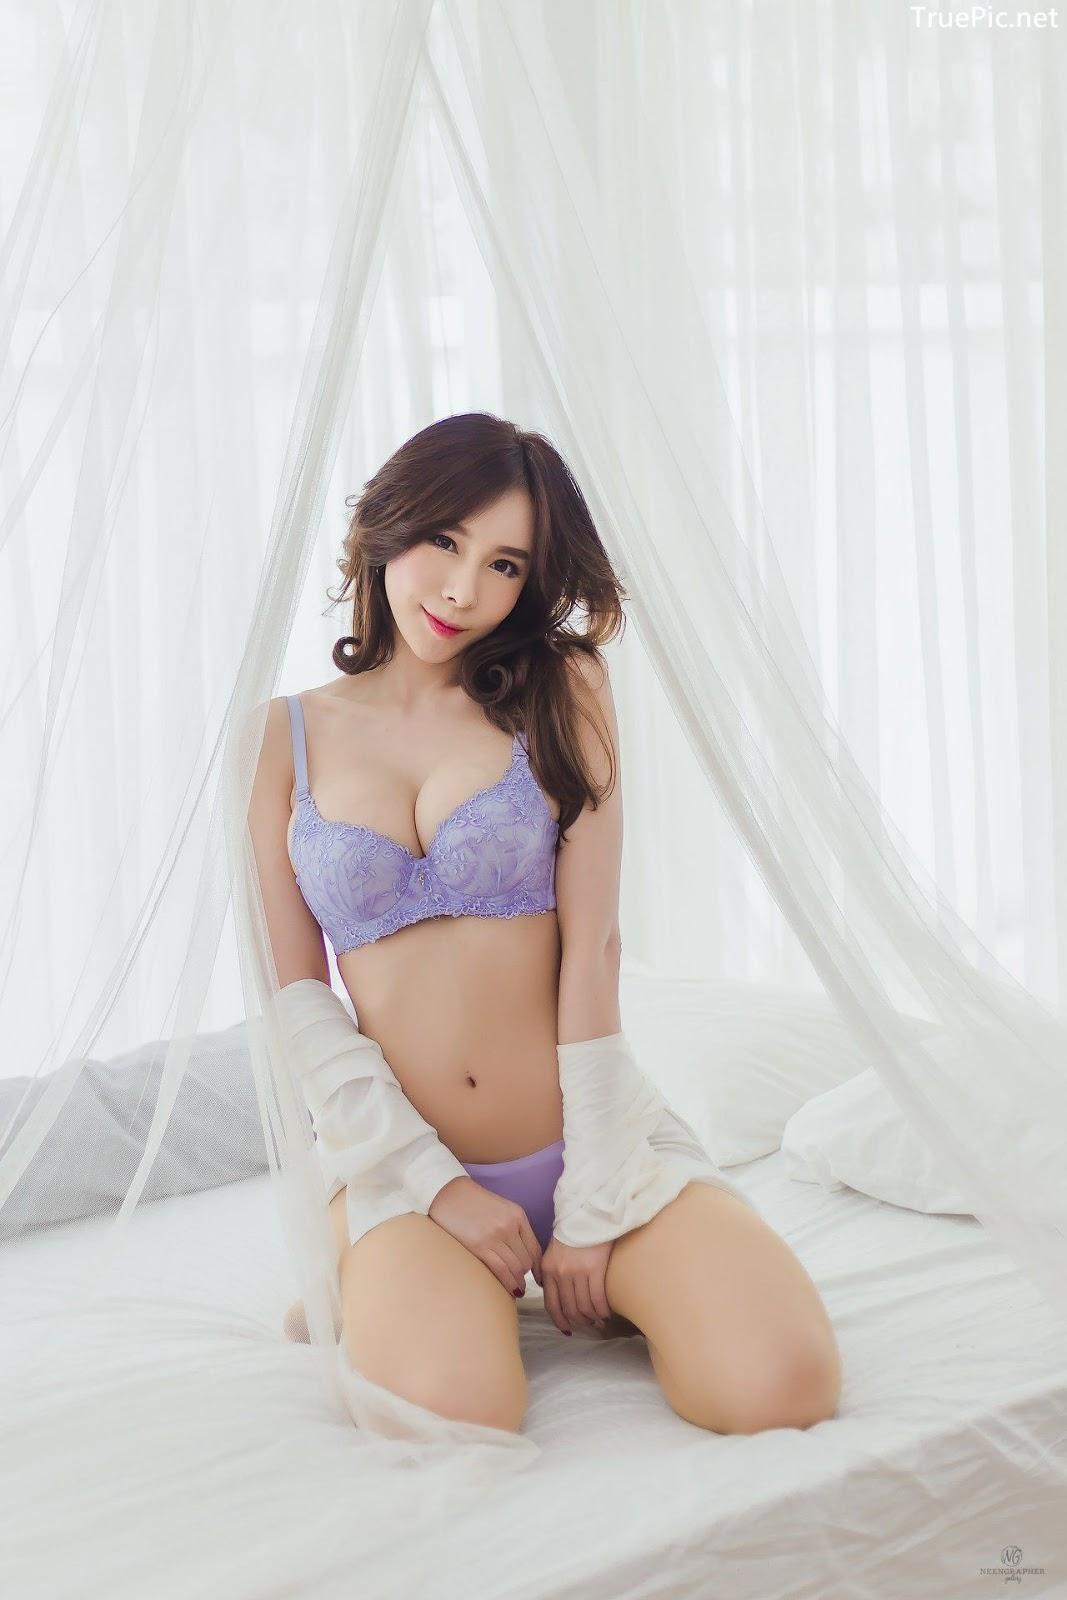 Image-Thailand-Hot-Model-Skykikijung-Purple-Lingerie-TruePic.net- Picture-8